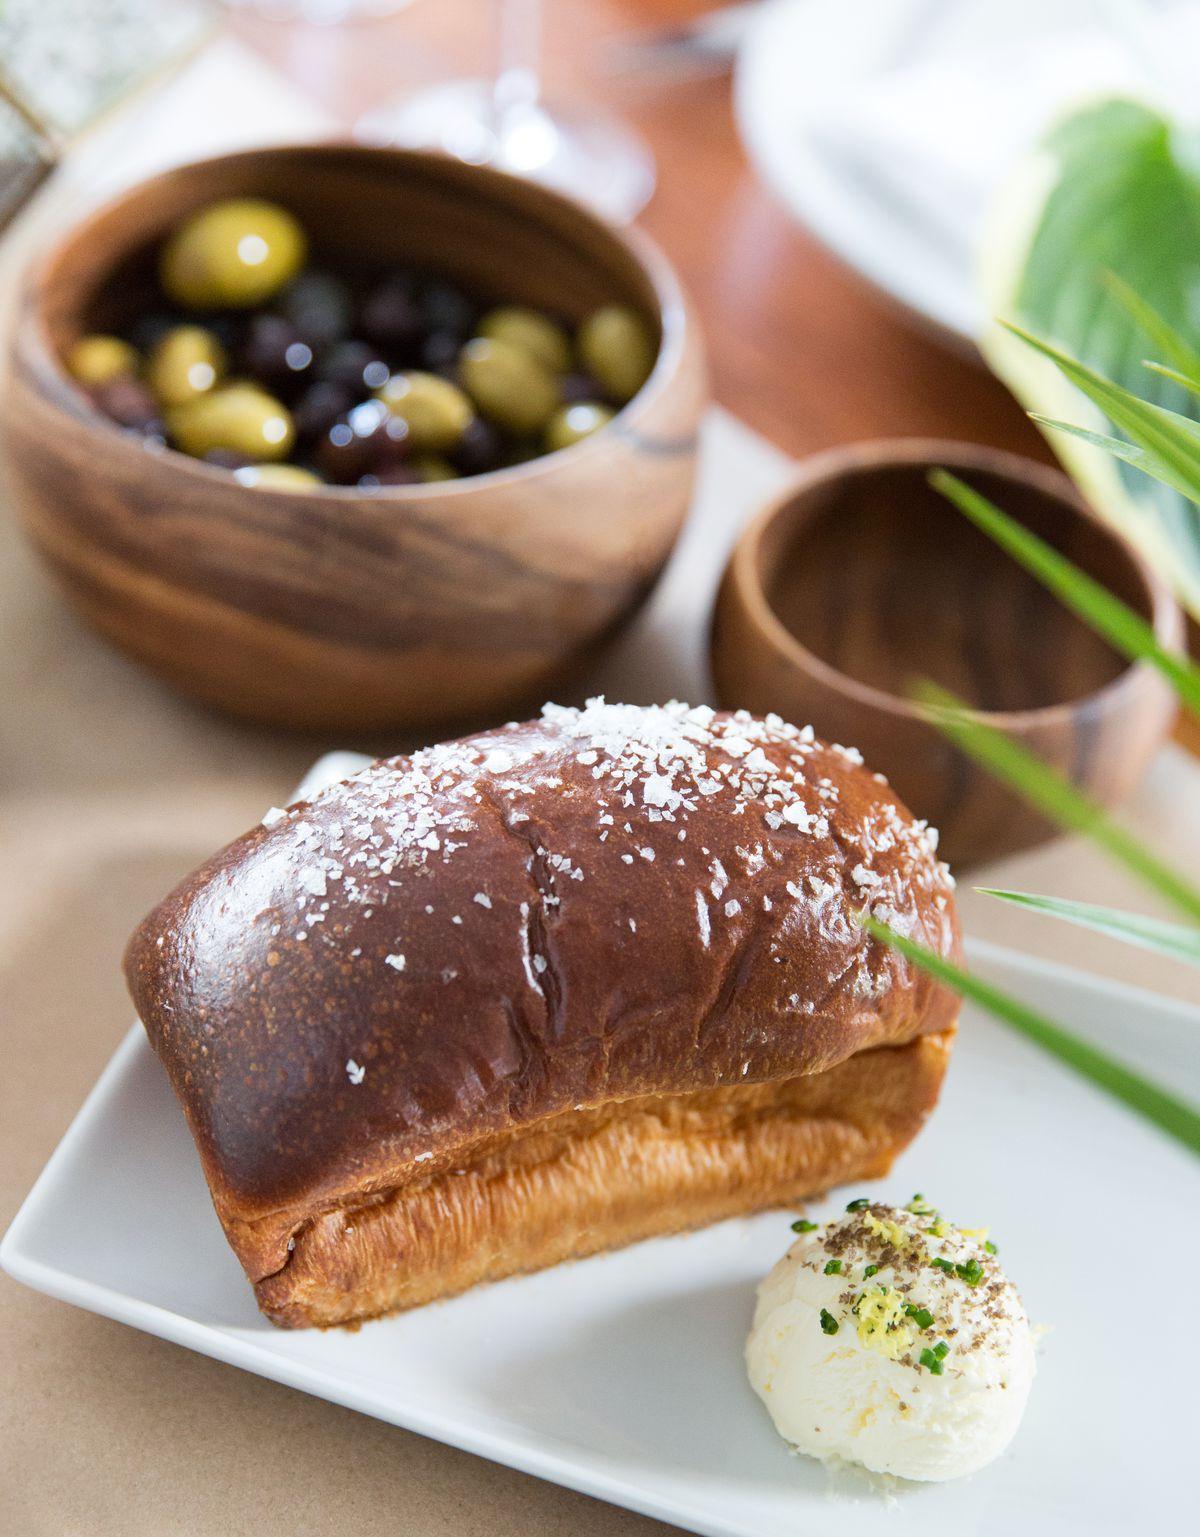 Central Standard's bread